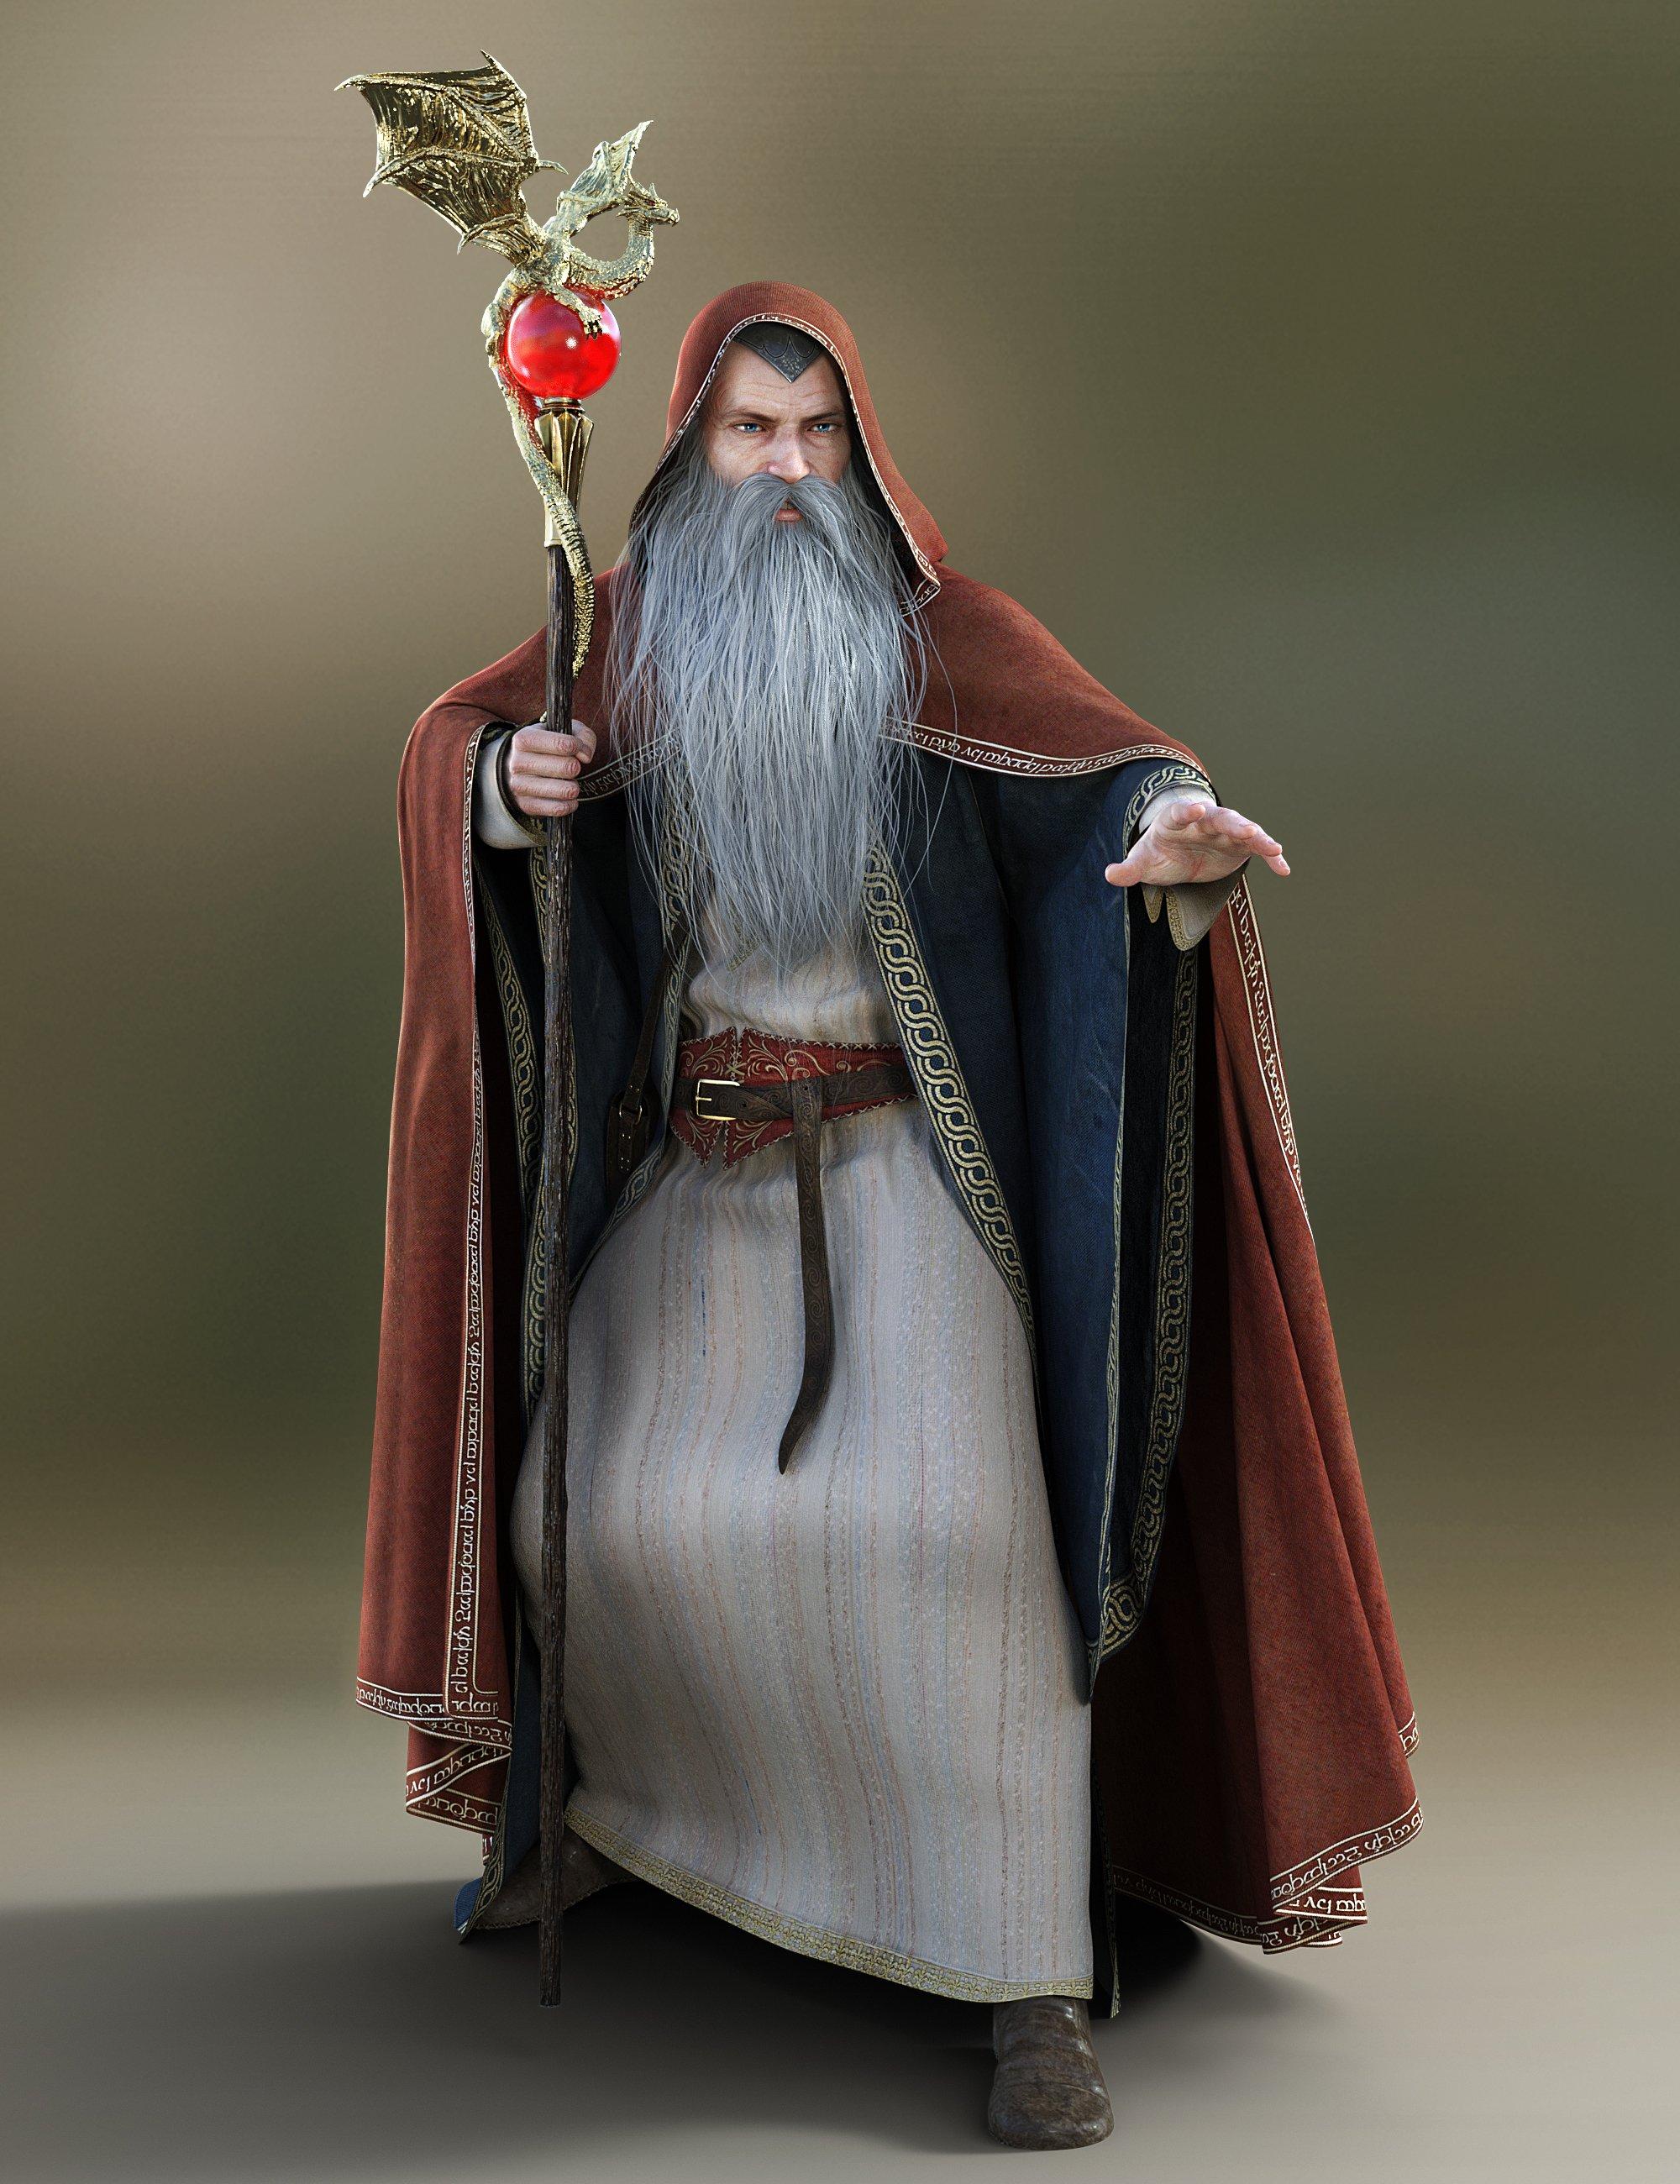 Magic Spell Caster Animations for Genesis 8 by: ThreeDigital, 3D Models by Daz 3D